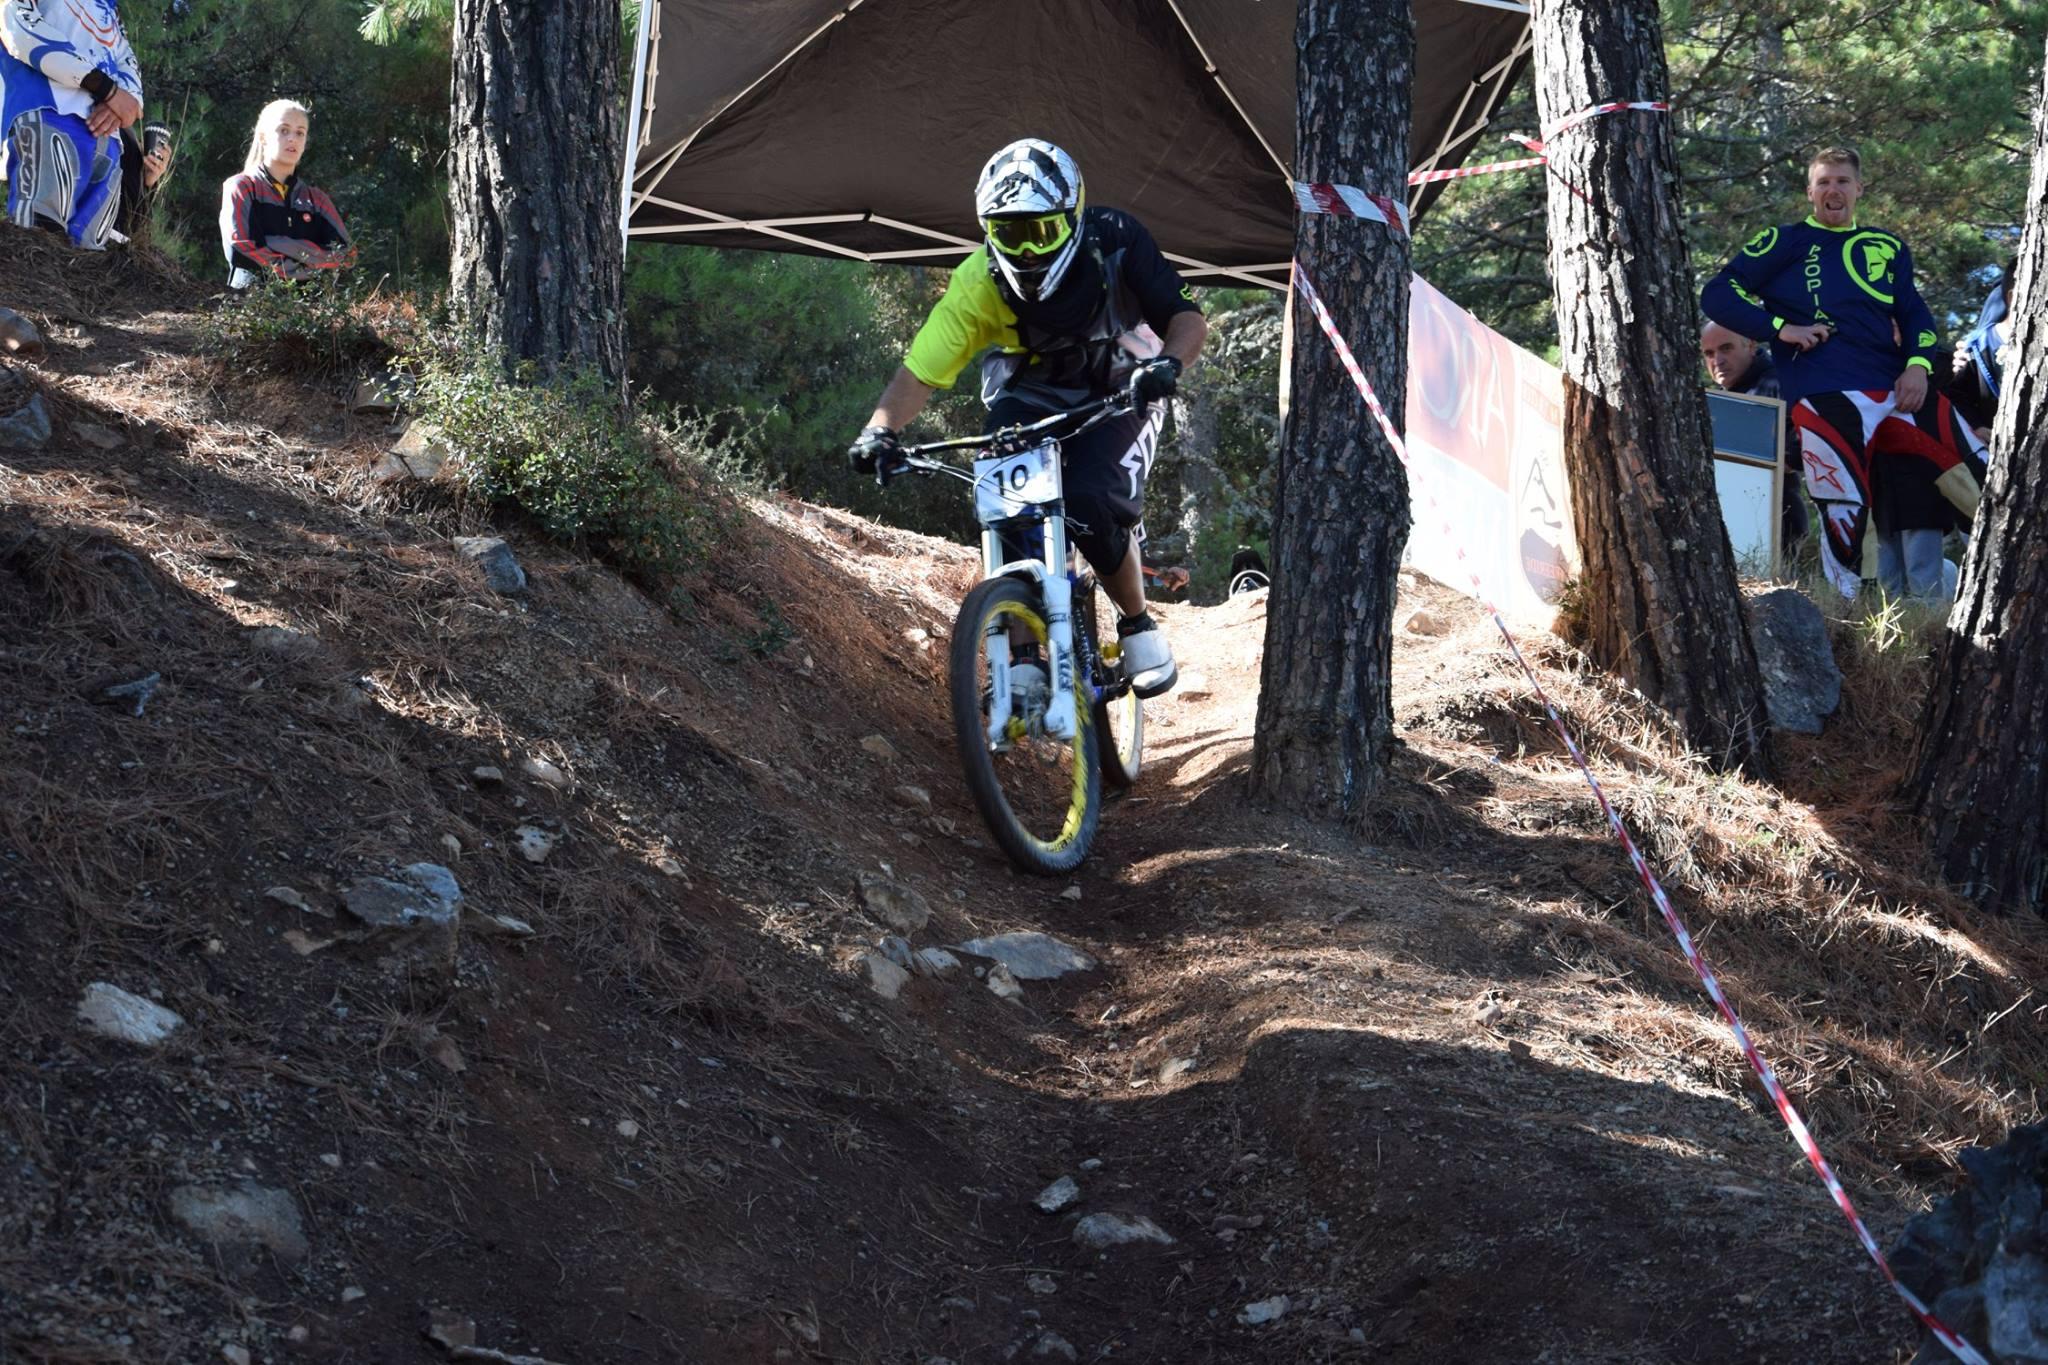 3o Τοπικό Πρωτάθλημα Κατάβασης 2017